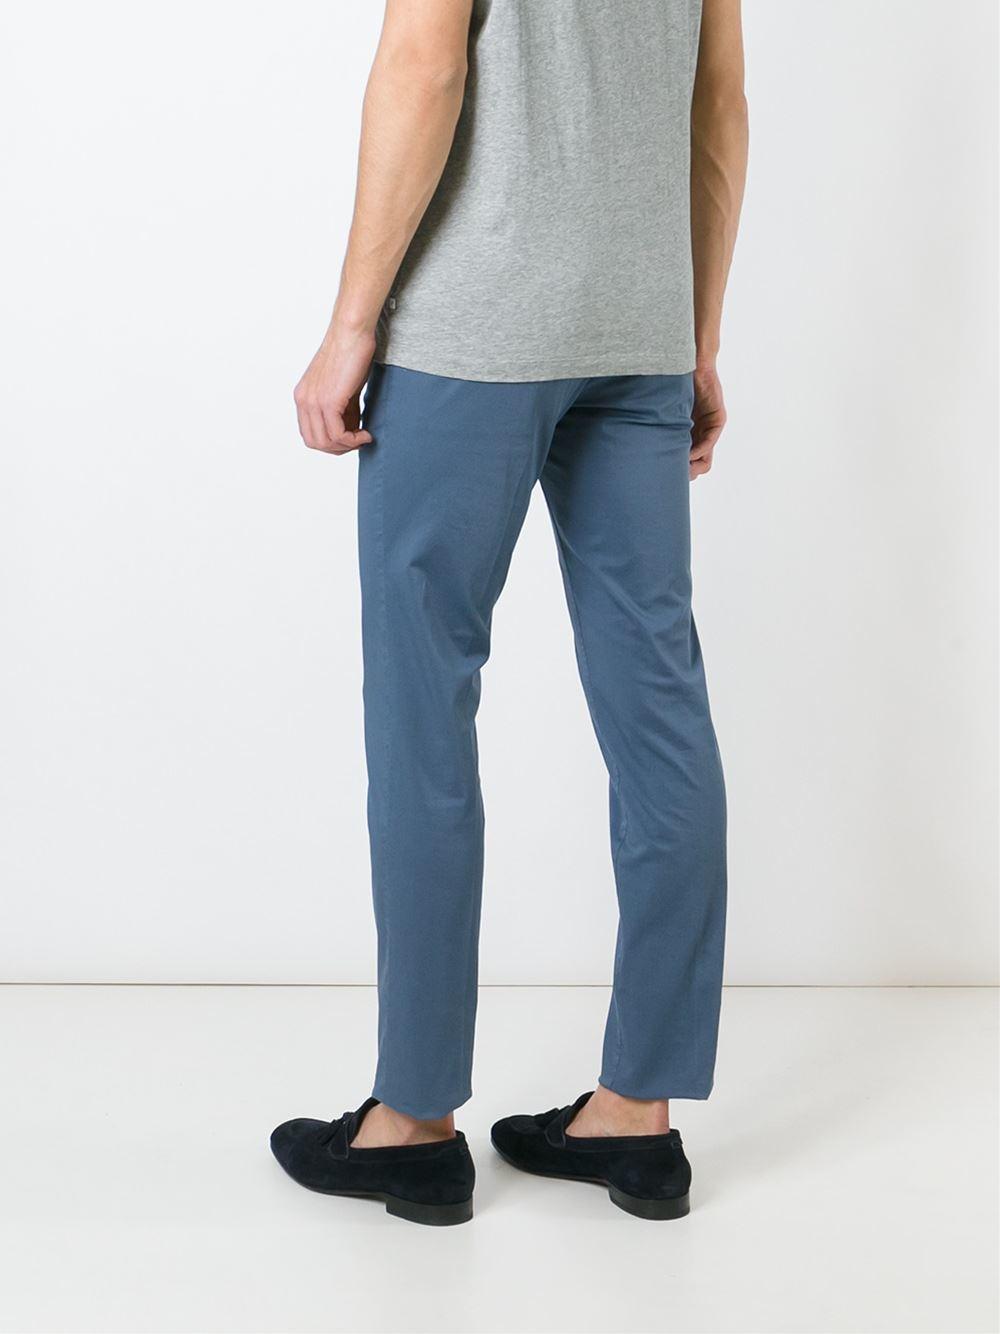 PT01 Cotton Malibu Chino Trousers in Blue for Men